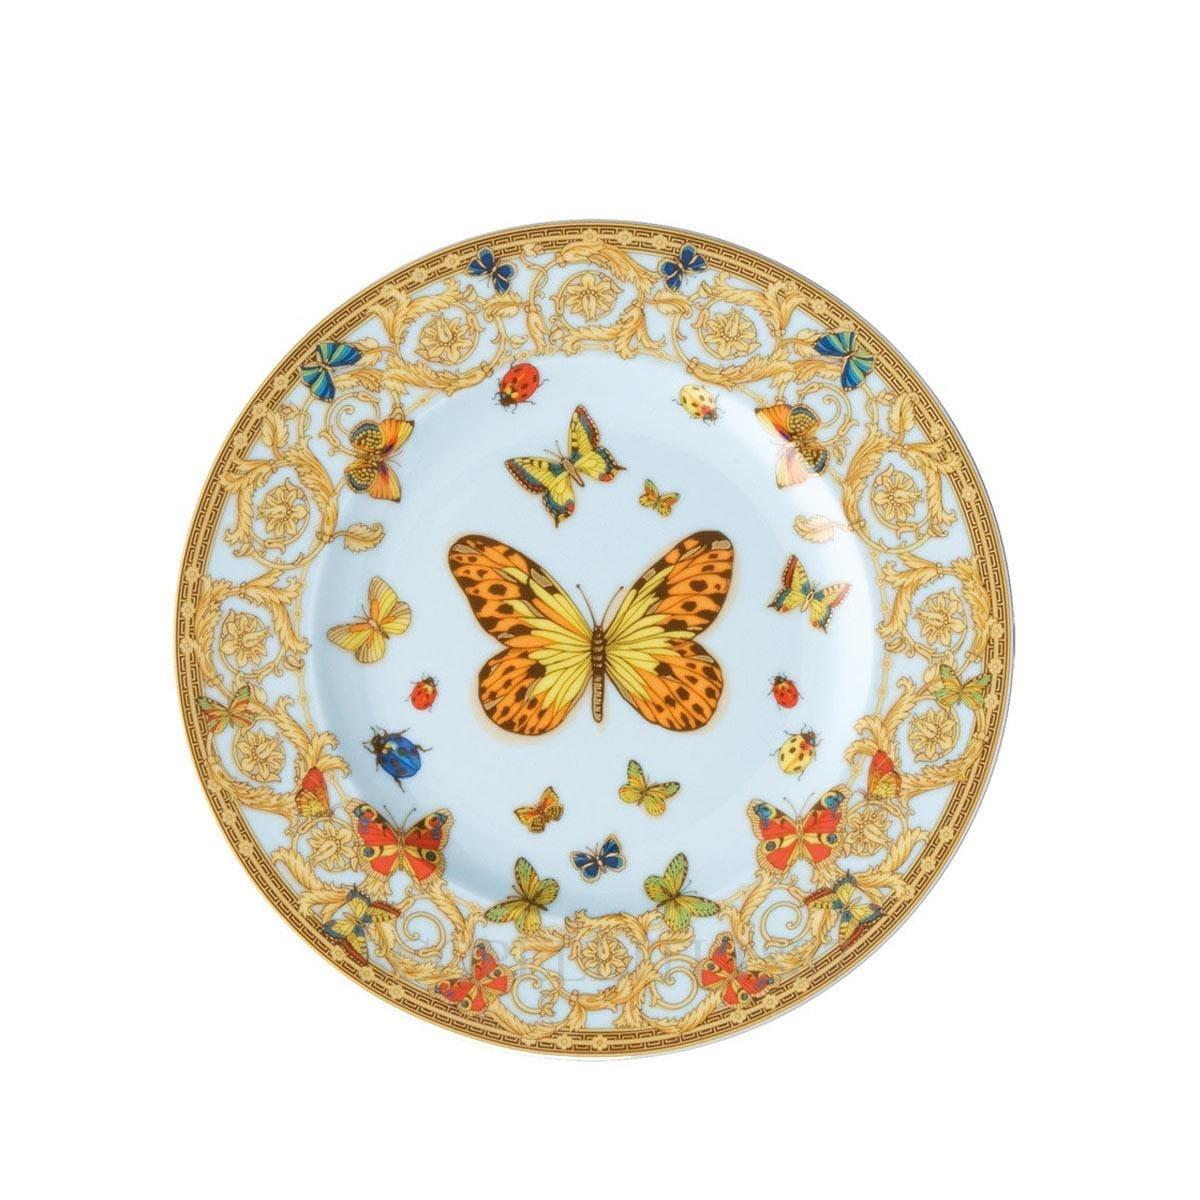 Versace Le Jardin de Versace small plate 18 cm by Rosenthal